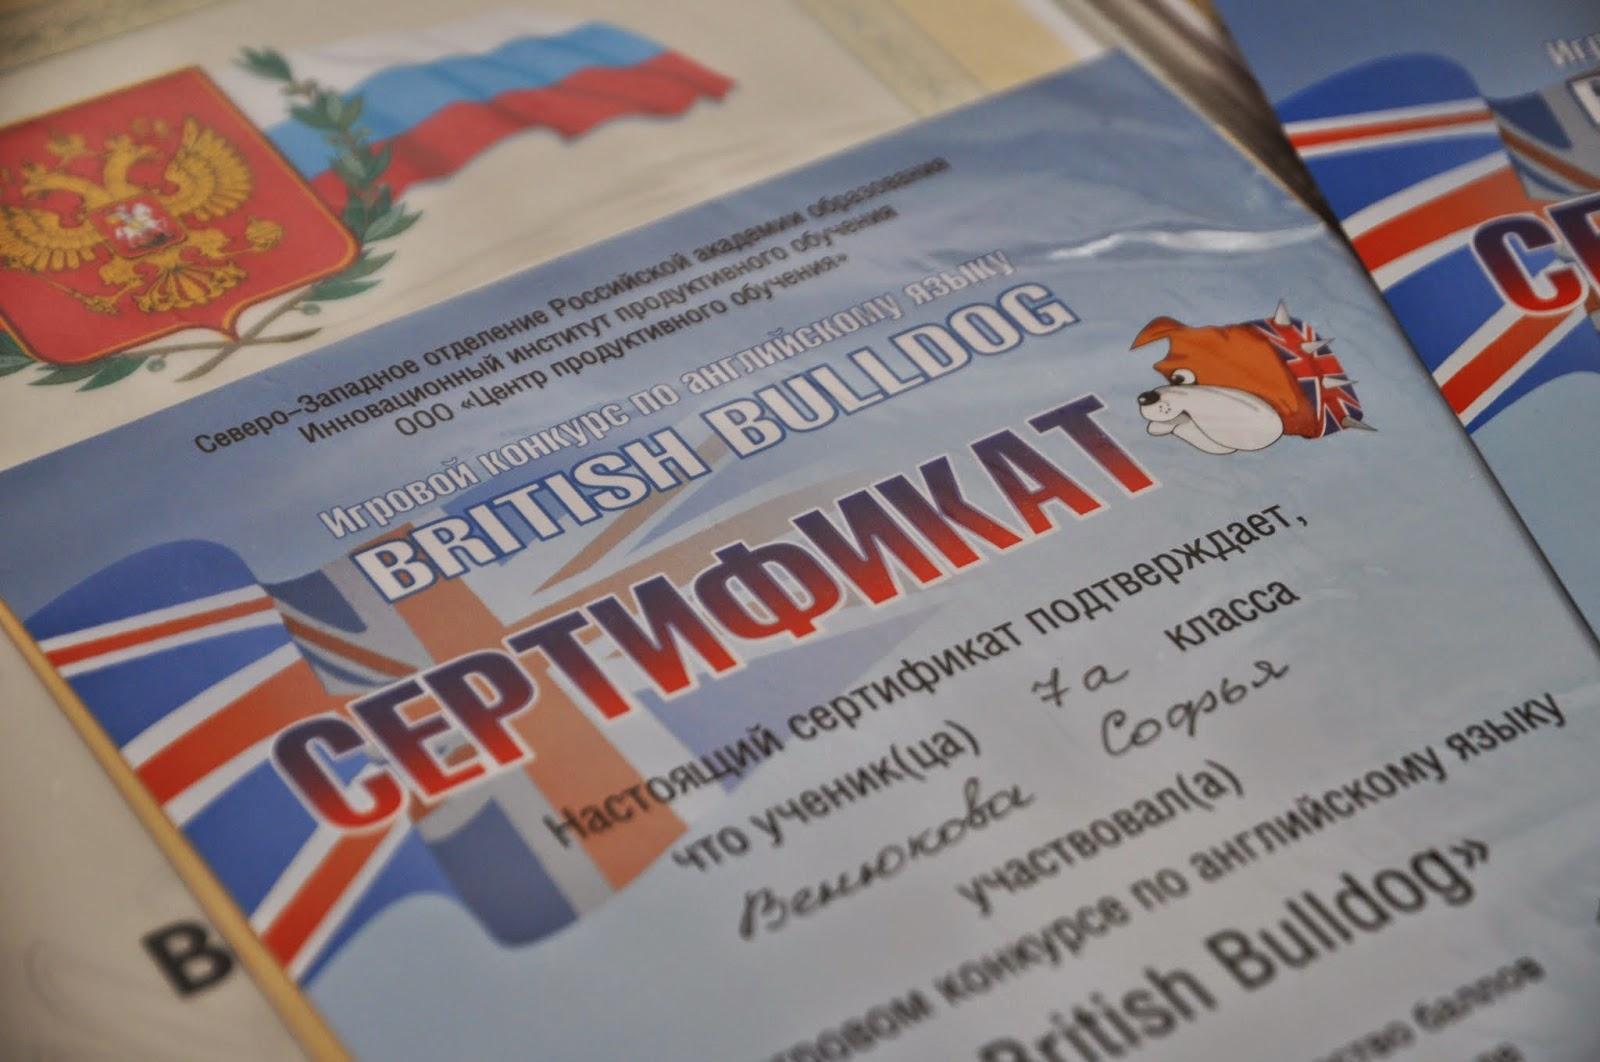 Дева Август 2018 год. Гороскоп на картах Таро. - Яндекс